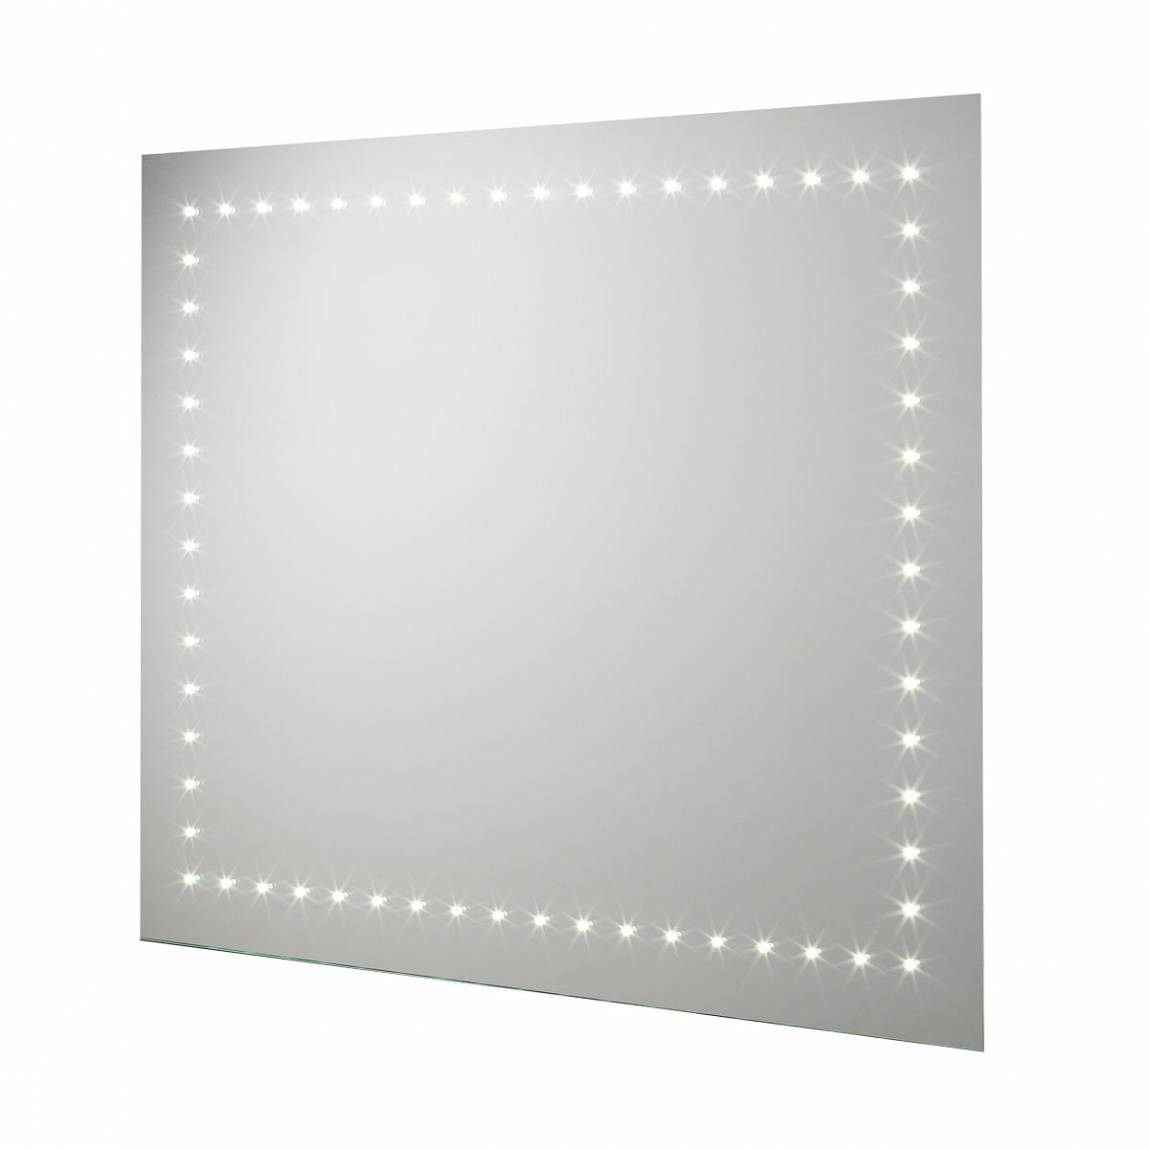 Image of Polaris LED Mirror